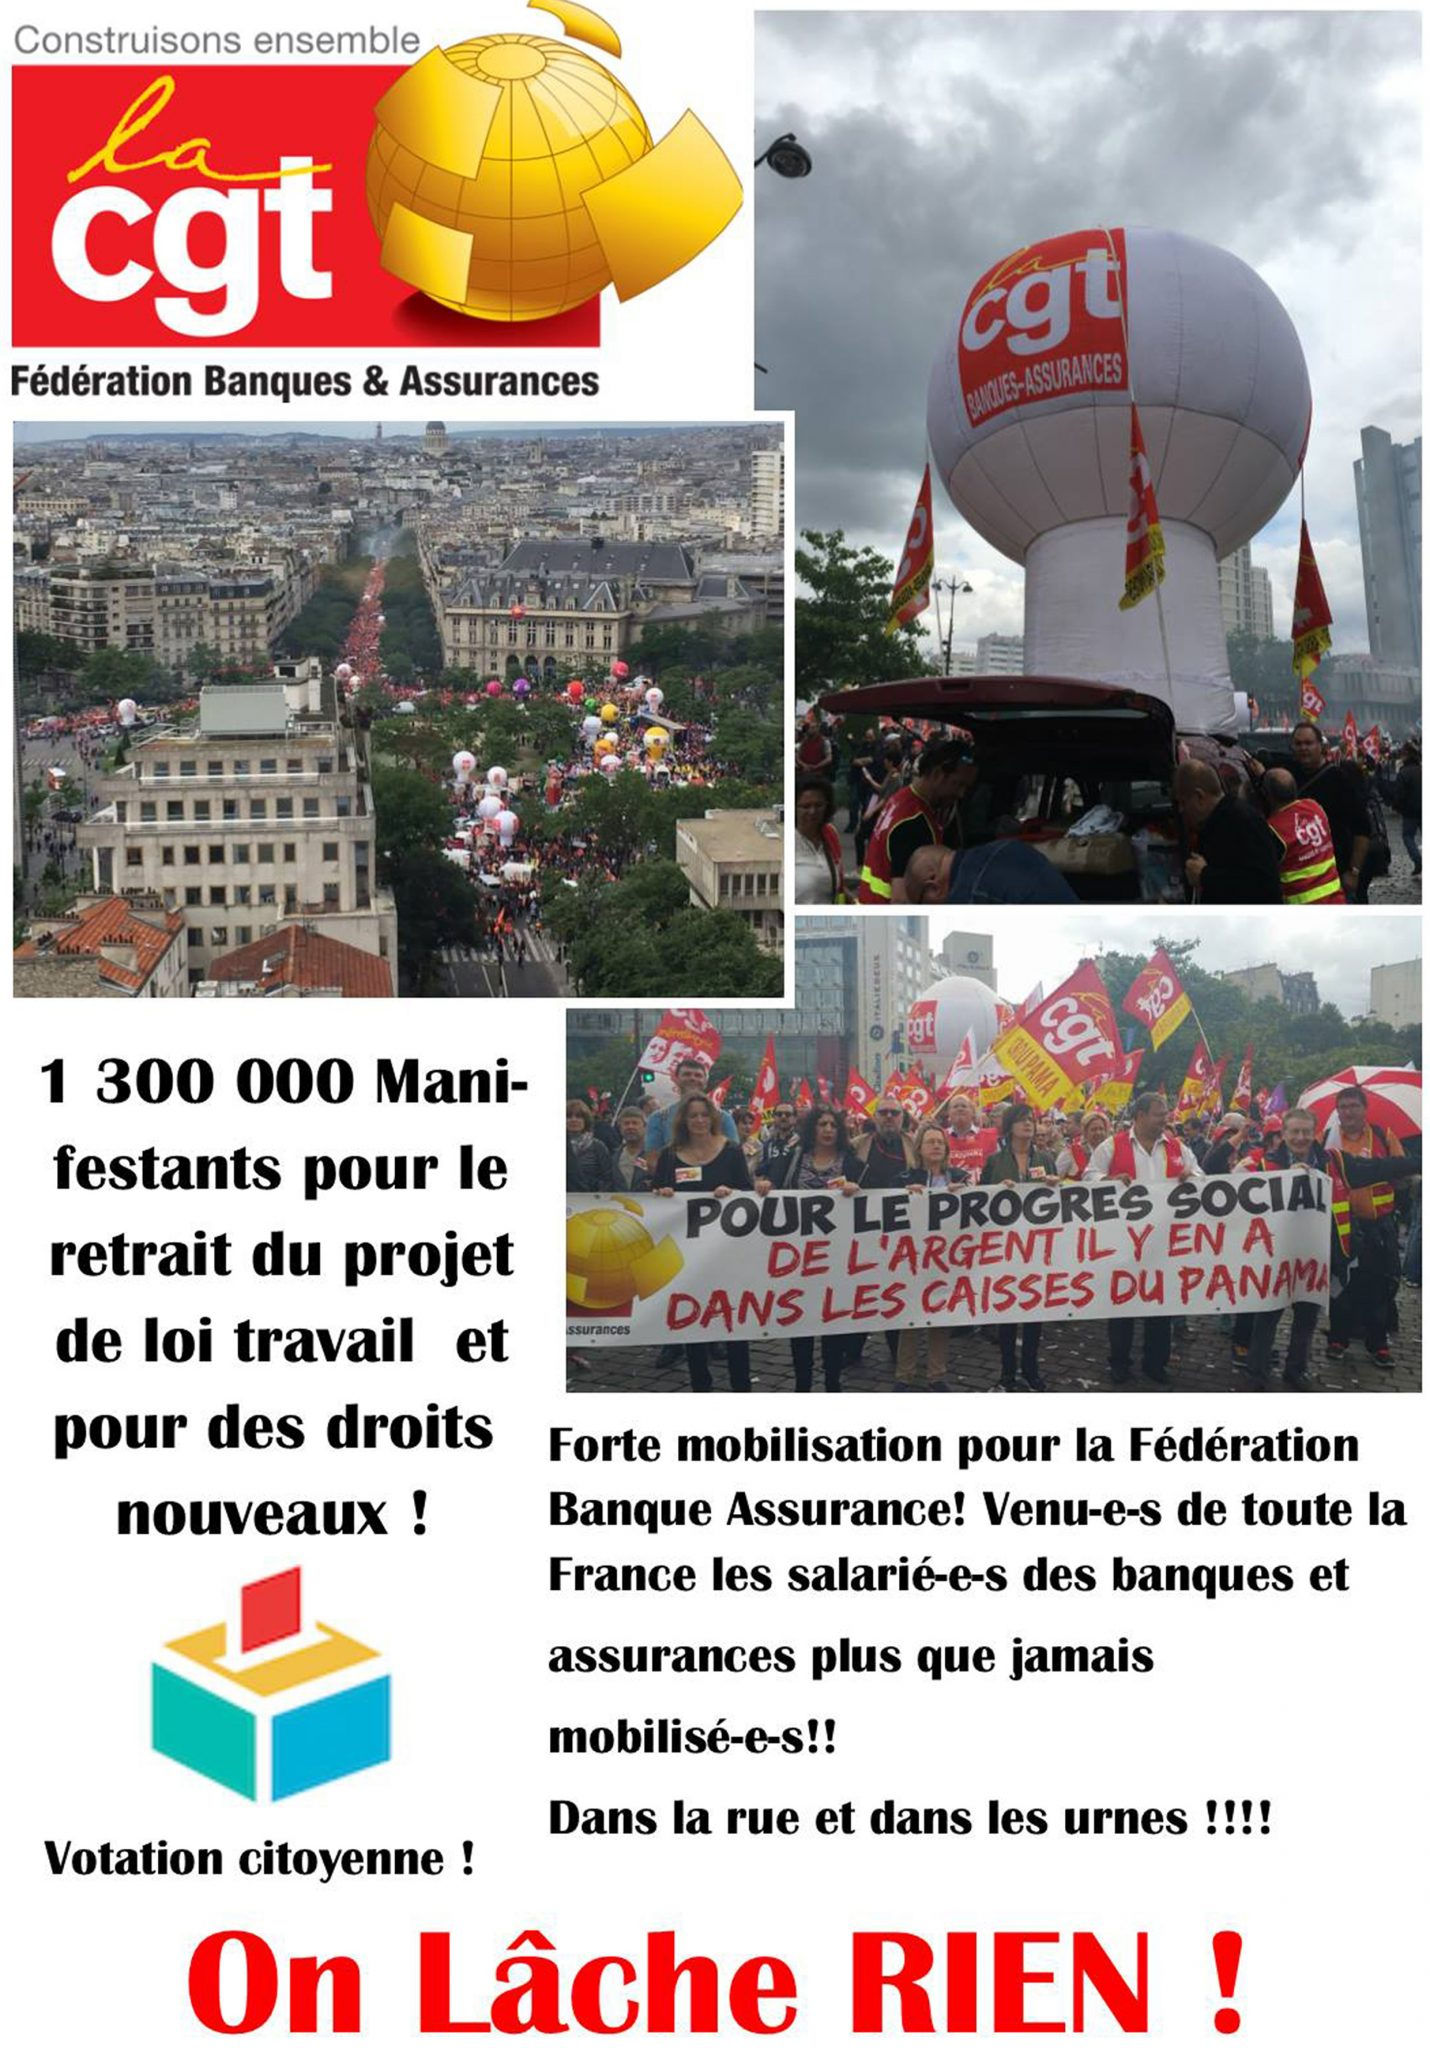 La CGT Banques Assurances - 14 juin 2016 - PARIS